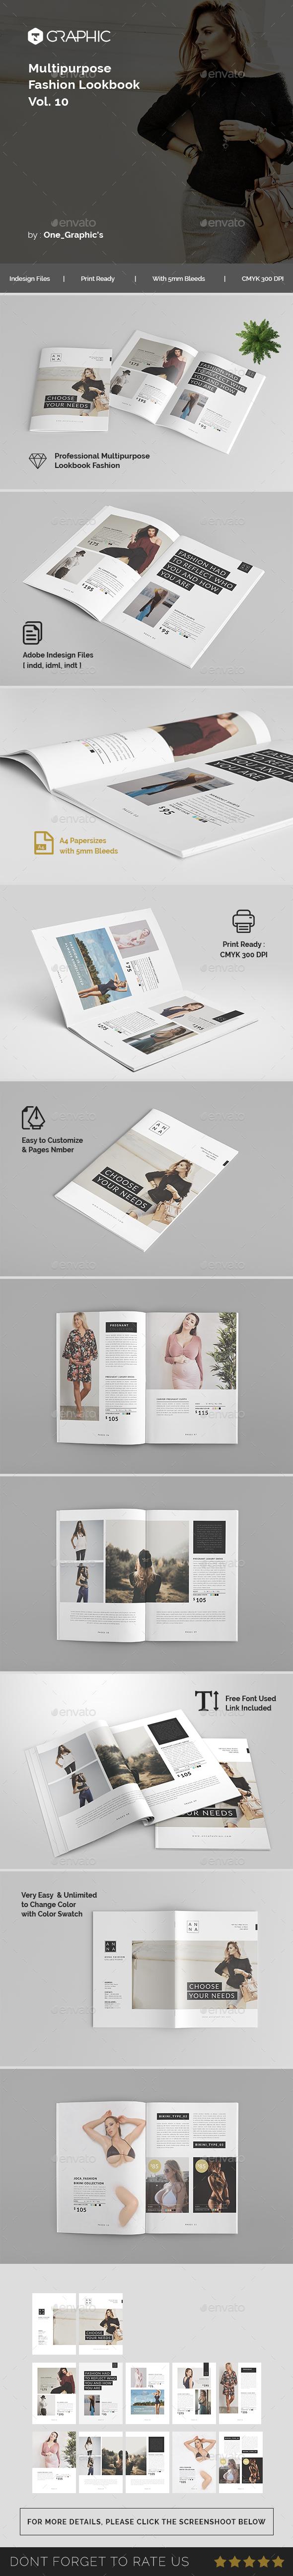 Fashion Lookbook Template Vol. 10 - Brochures Print Templates